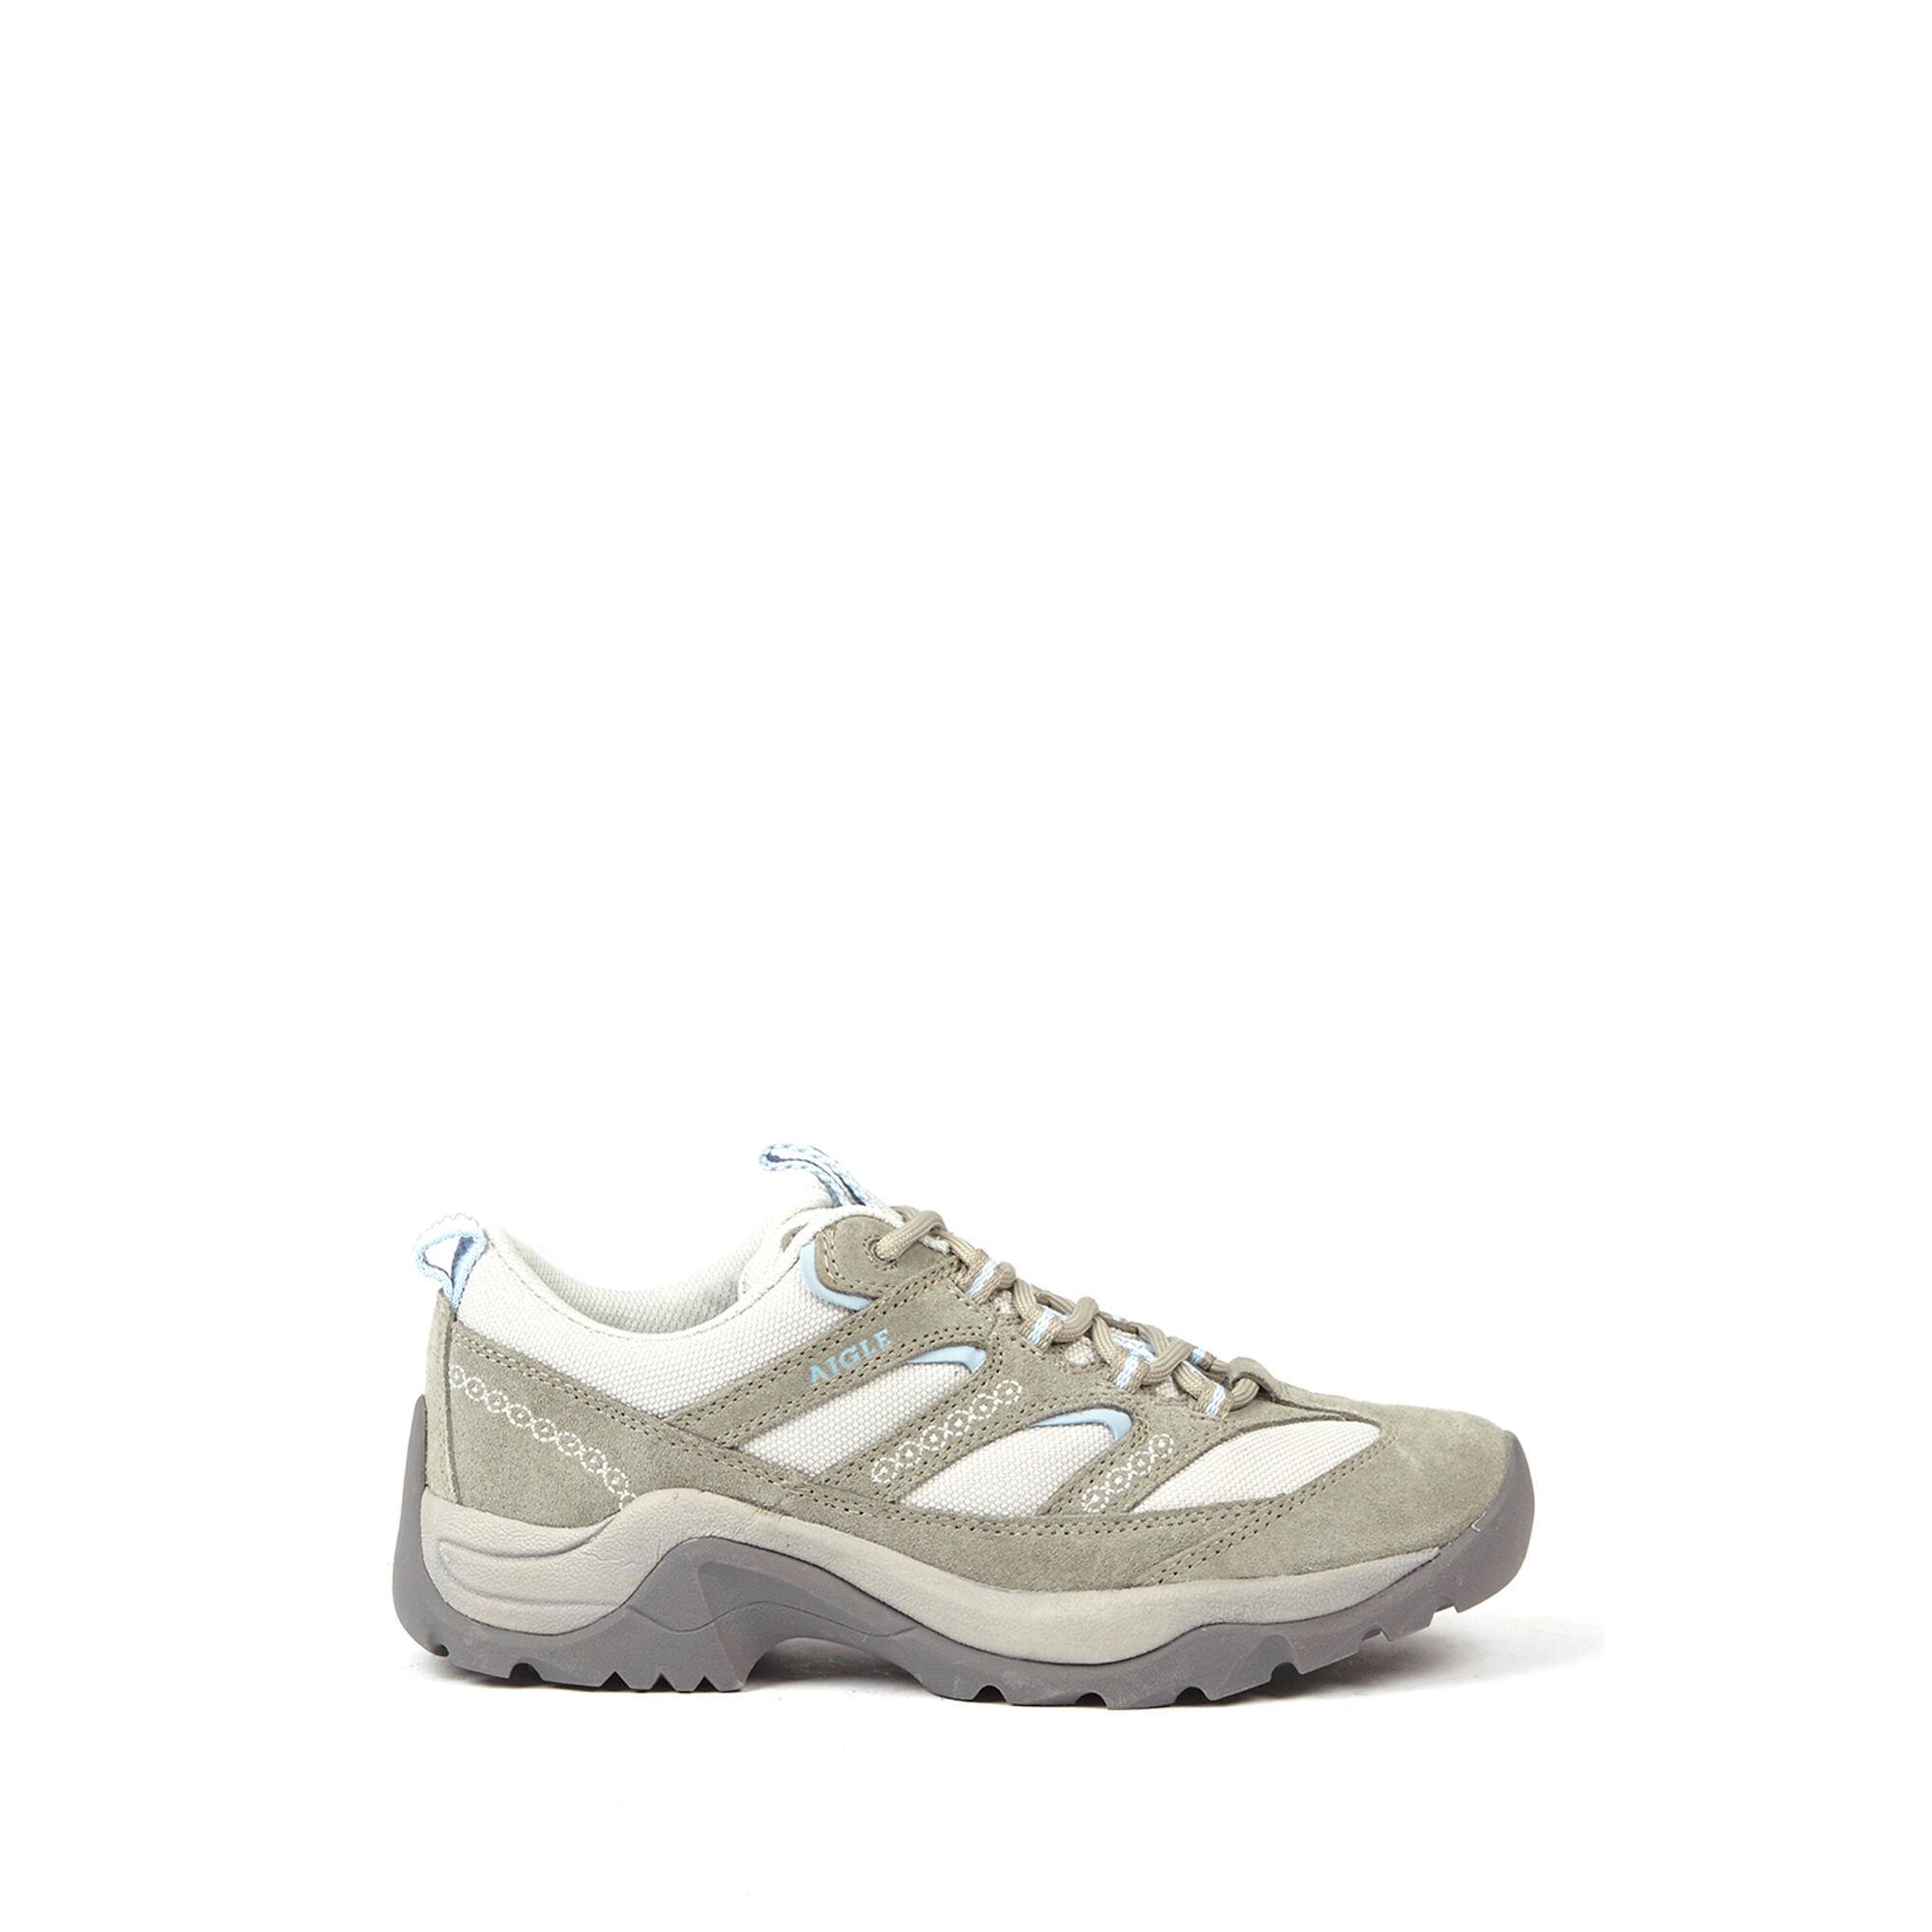 Femme Loisirs Storefront Catalog Fr Chaussures Cuir De Aigle 1SXtZ